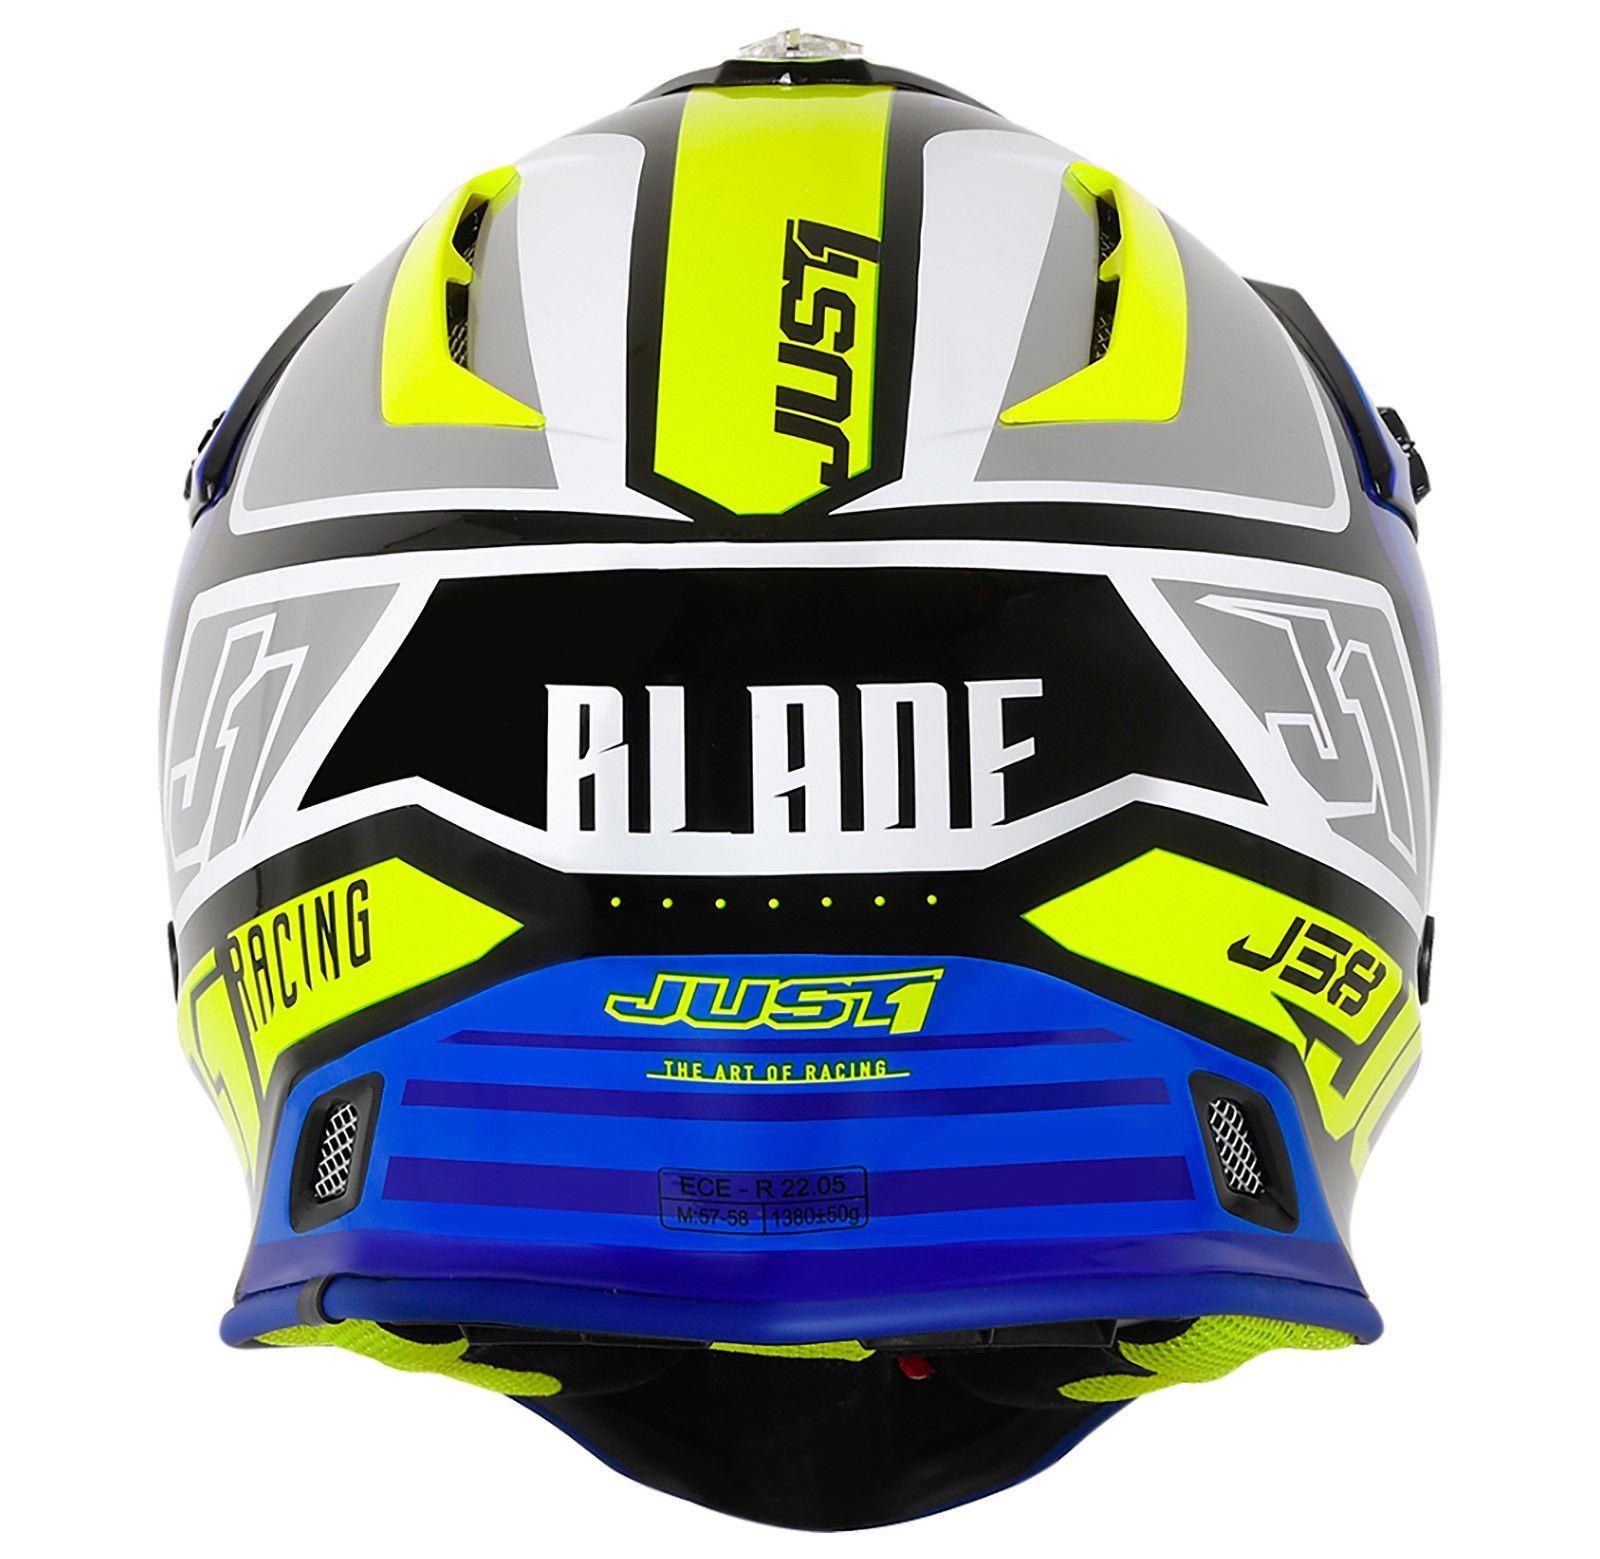 Just1-J38-Blade-Helmet-Motocross-Enduro-MX-ATV-Motorcycle-Off-Road-Full-Face-ACU thumbnail 17